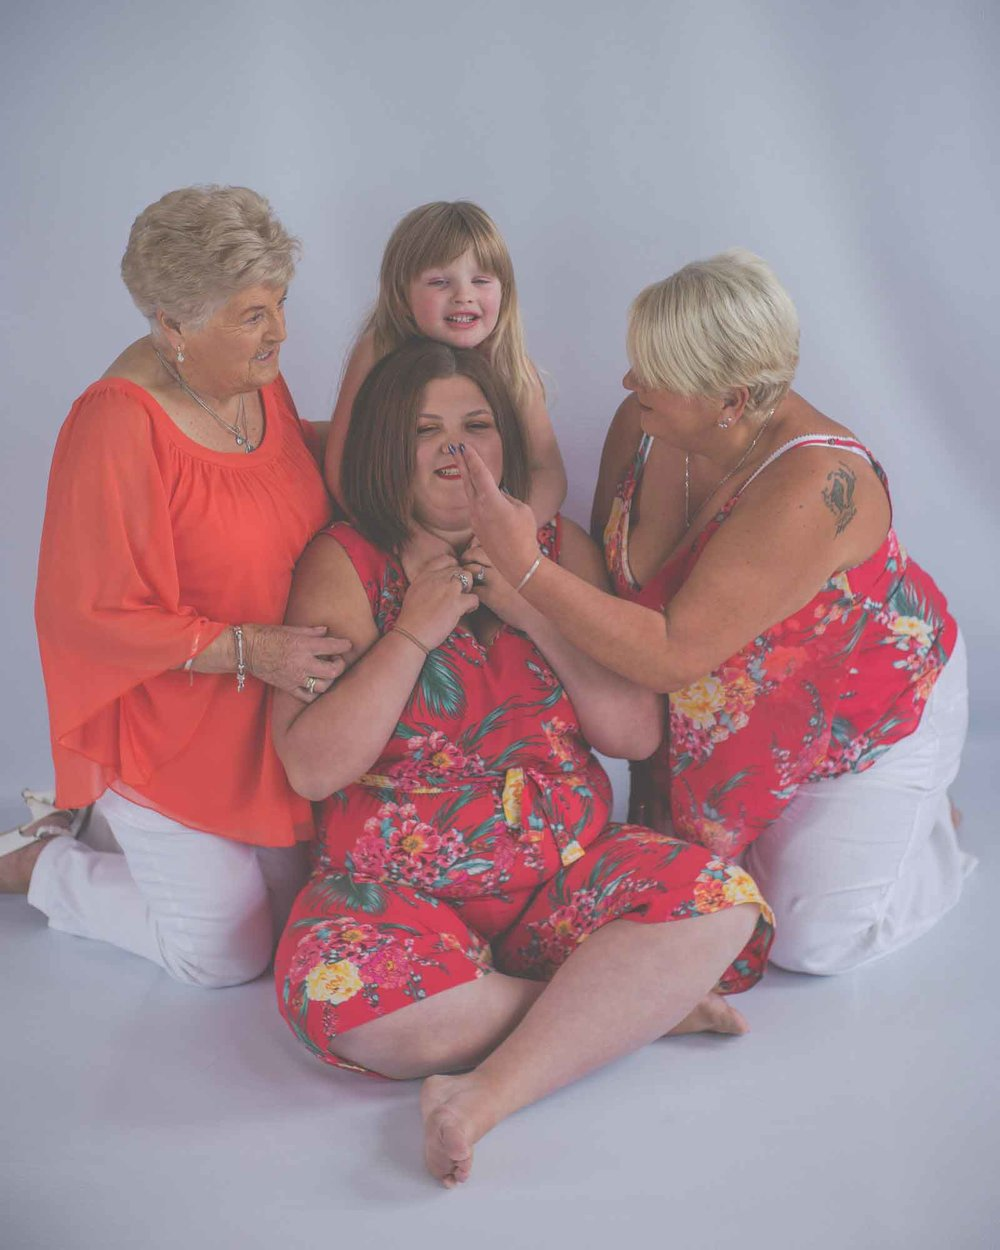 bradford-skipton-keighley-family-photoshoot-chicca-photography-03.jpg